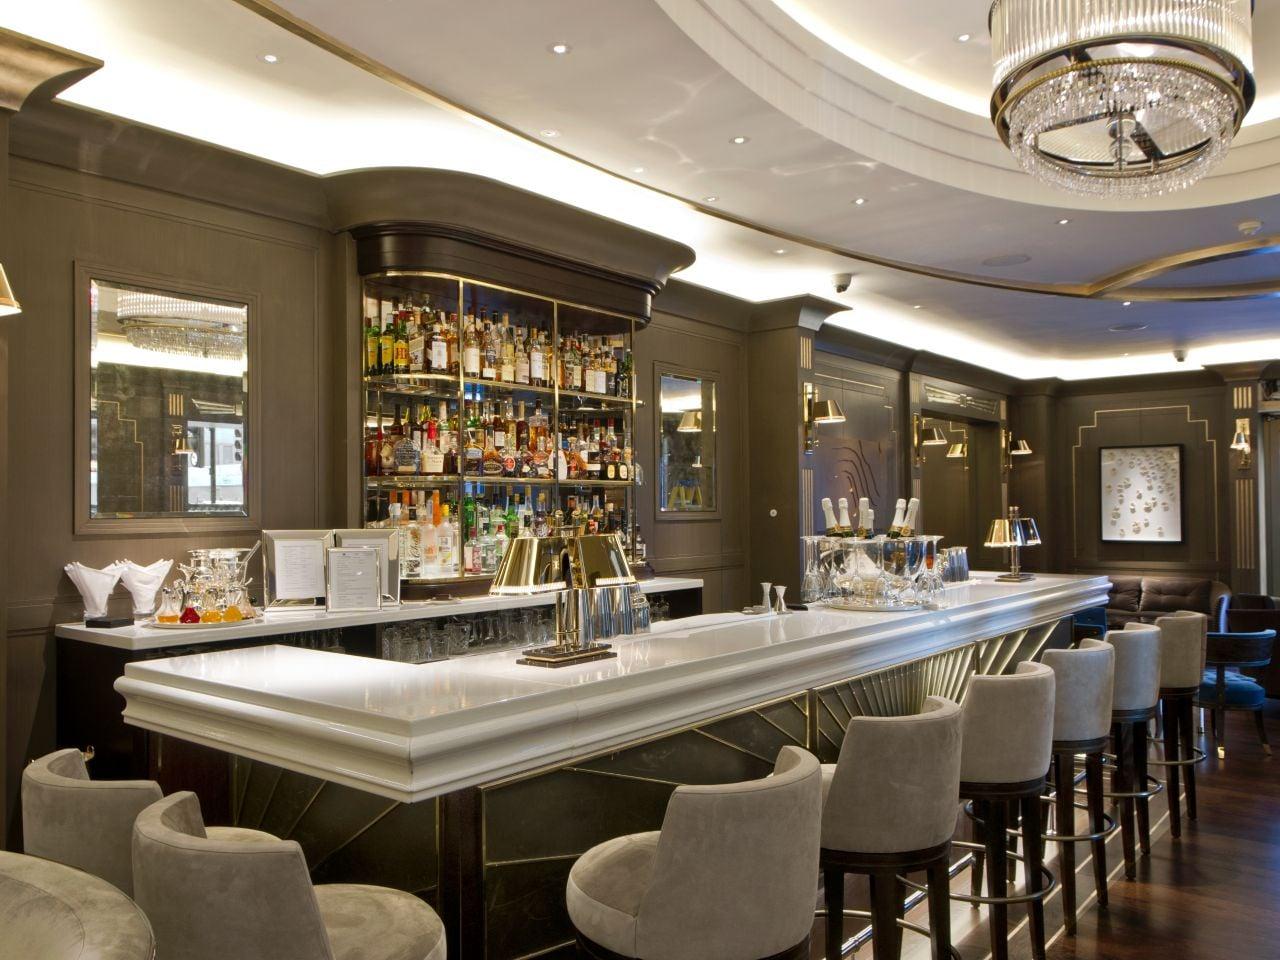 The Churchill Bar | Marylebone Bar